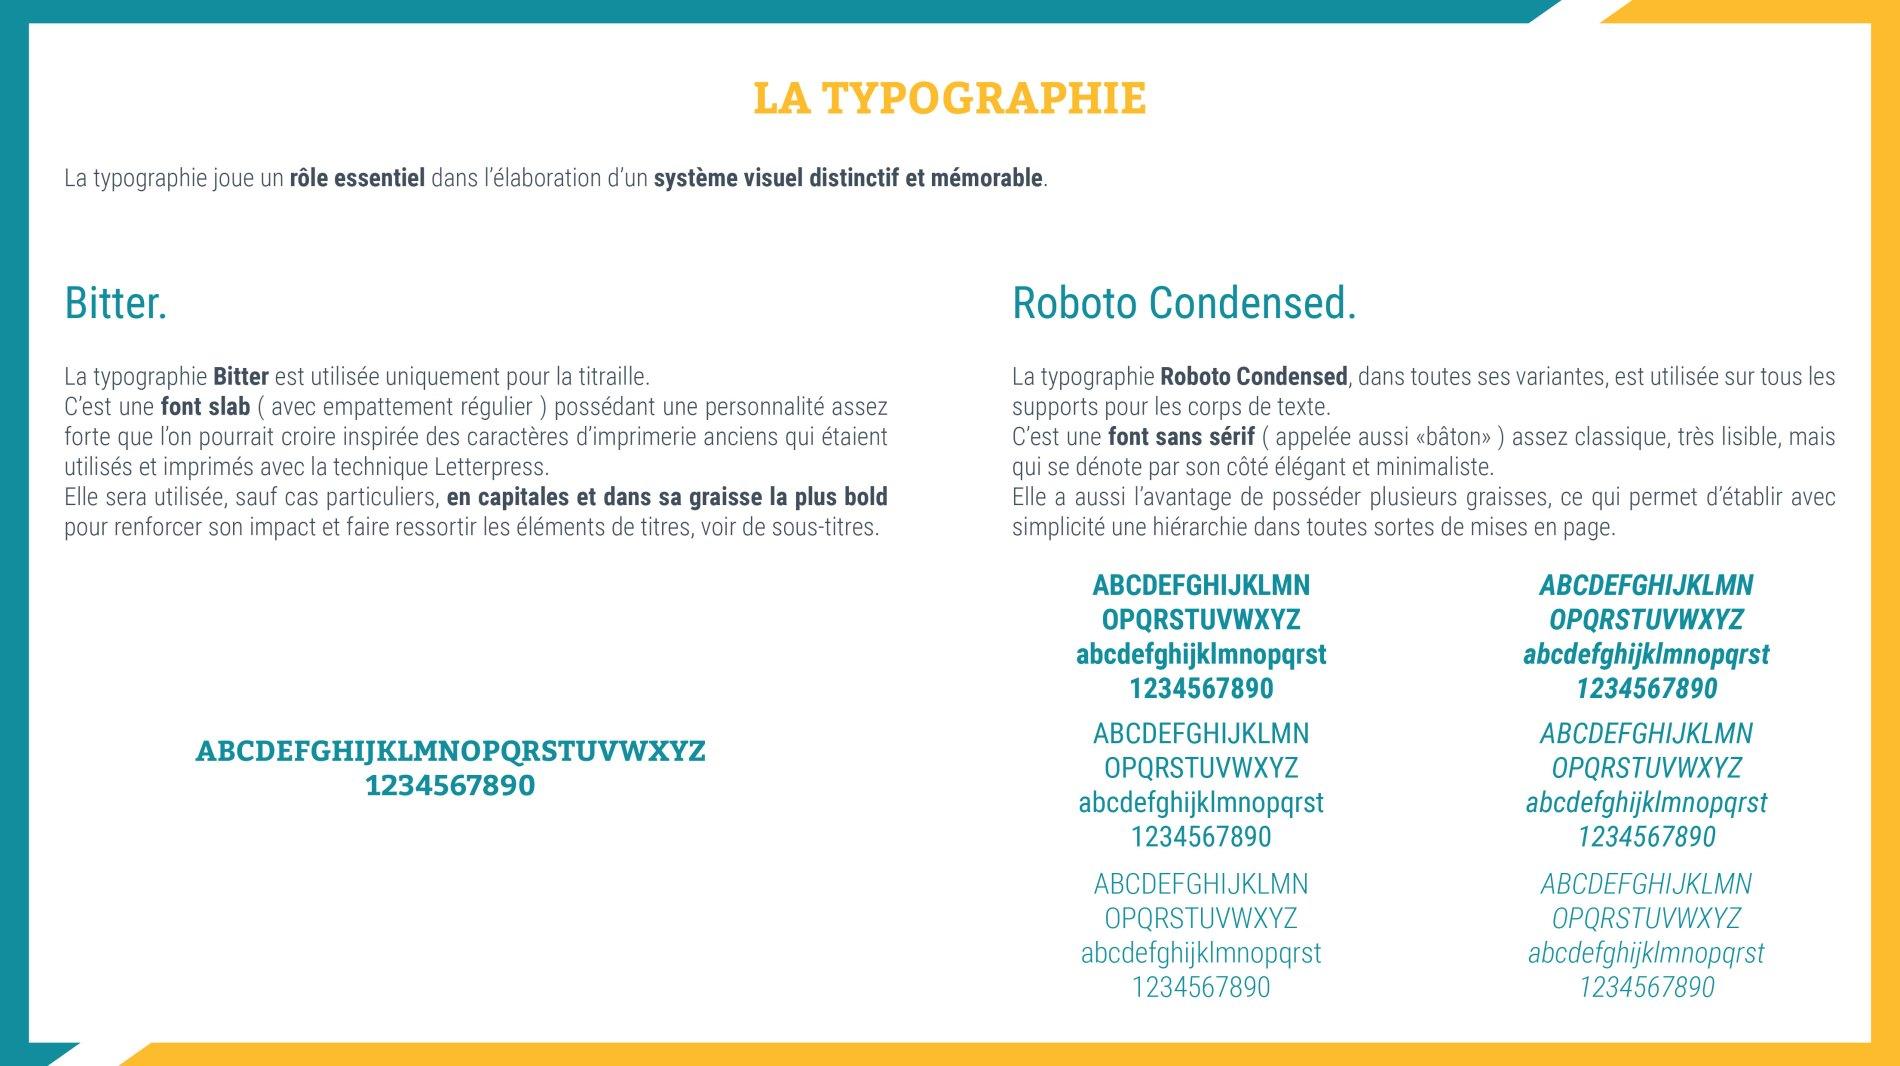 flowhynot-florent-beaufils-graphiste-typographe-illustrateur-refonte-identite-concept-image